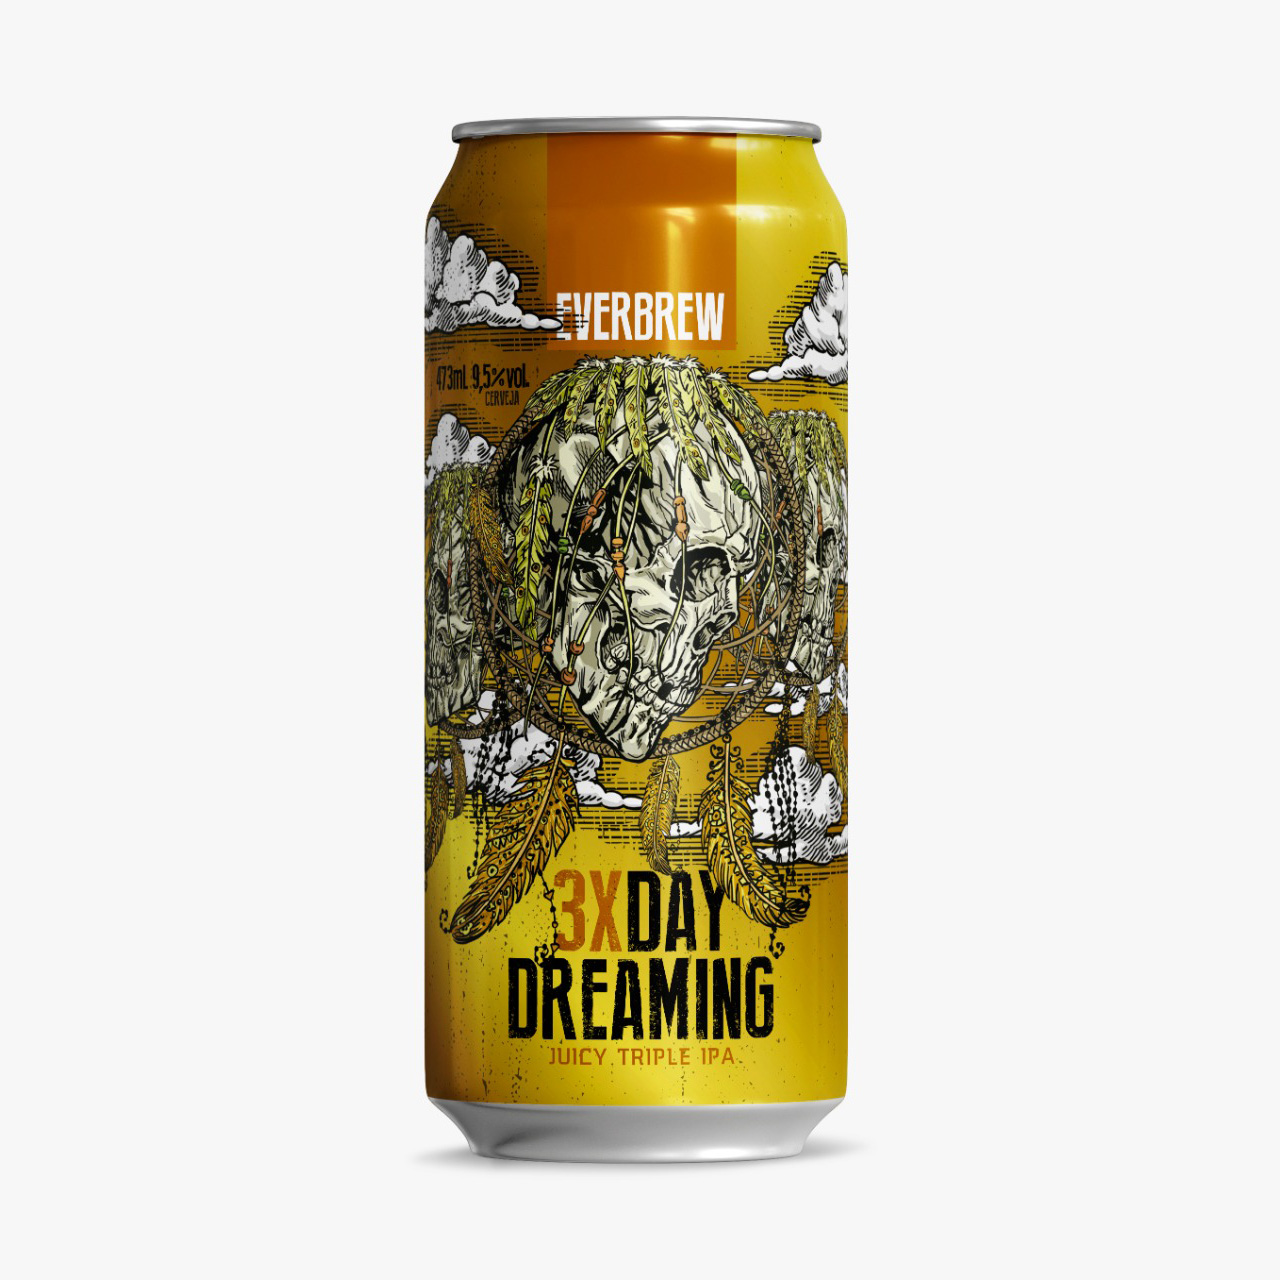 Cerveja Everbrew 3x Day Dreaming Triple NEIPA Lata 473ml  - Geek N